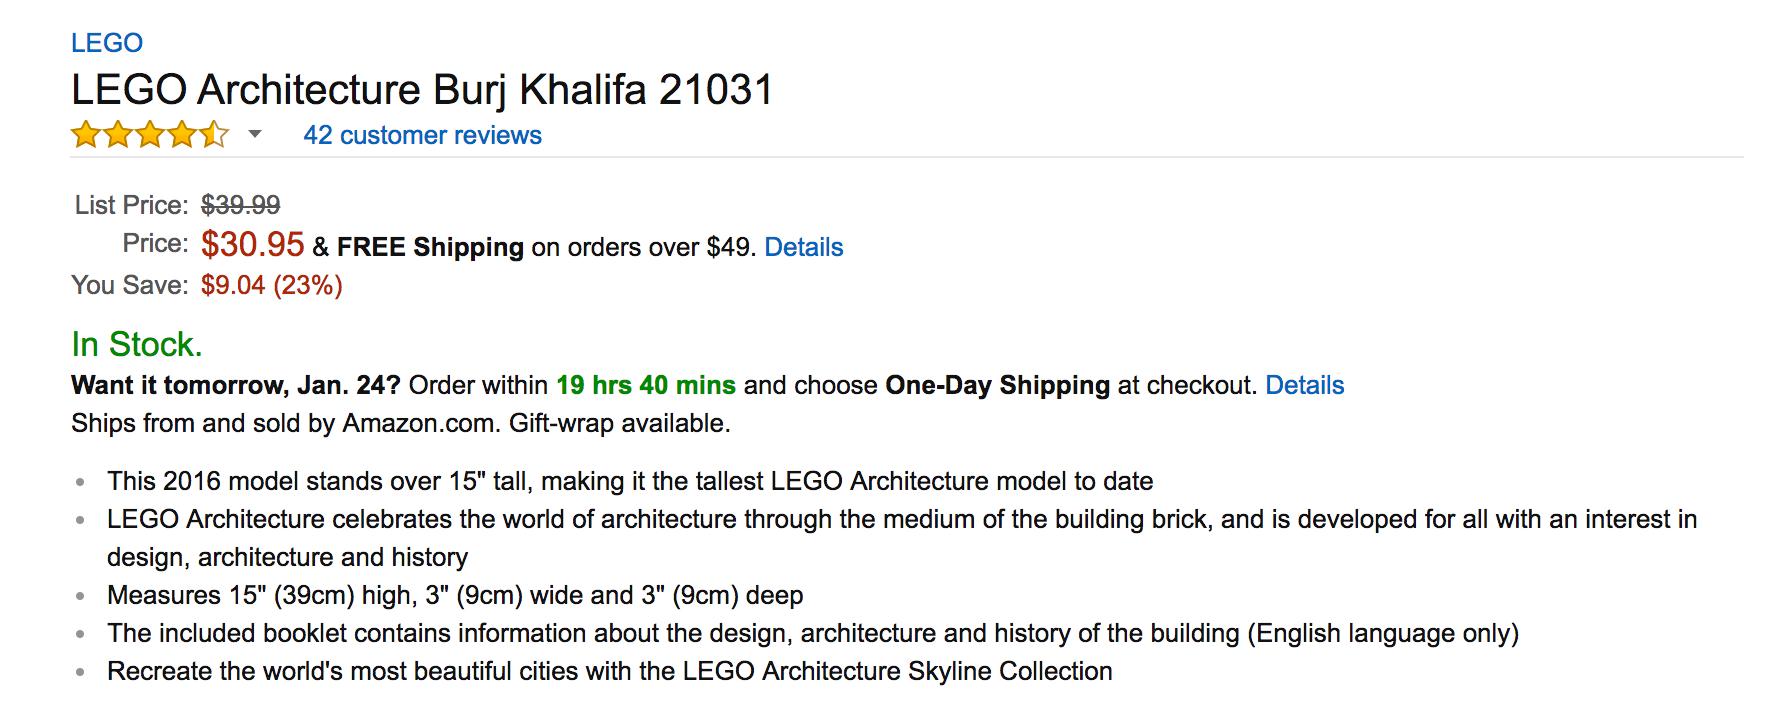 lego-architecture-burj-khalifa-4